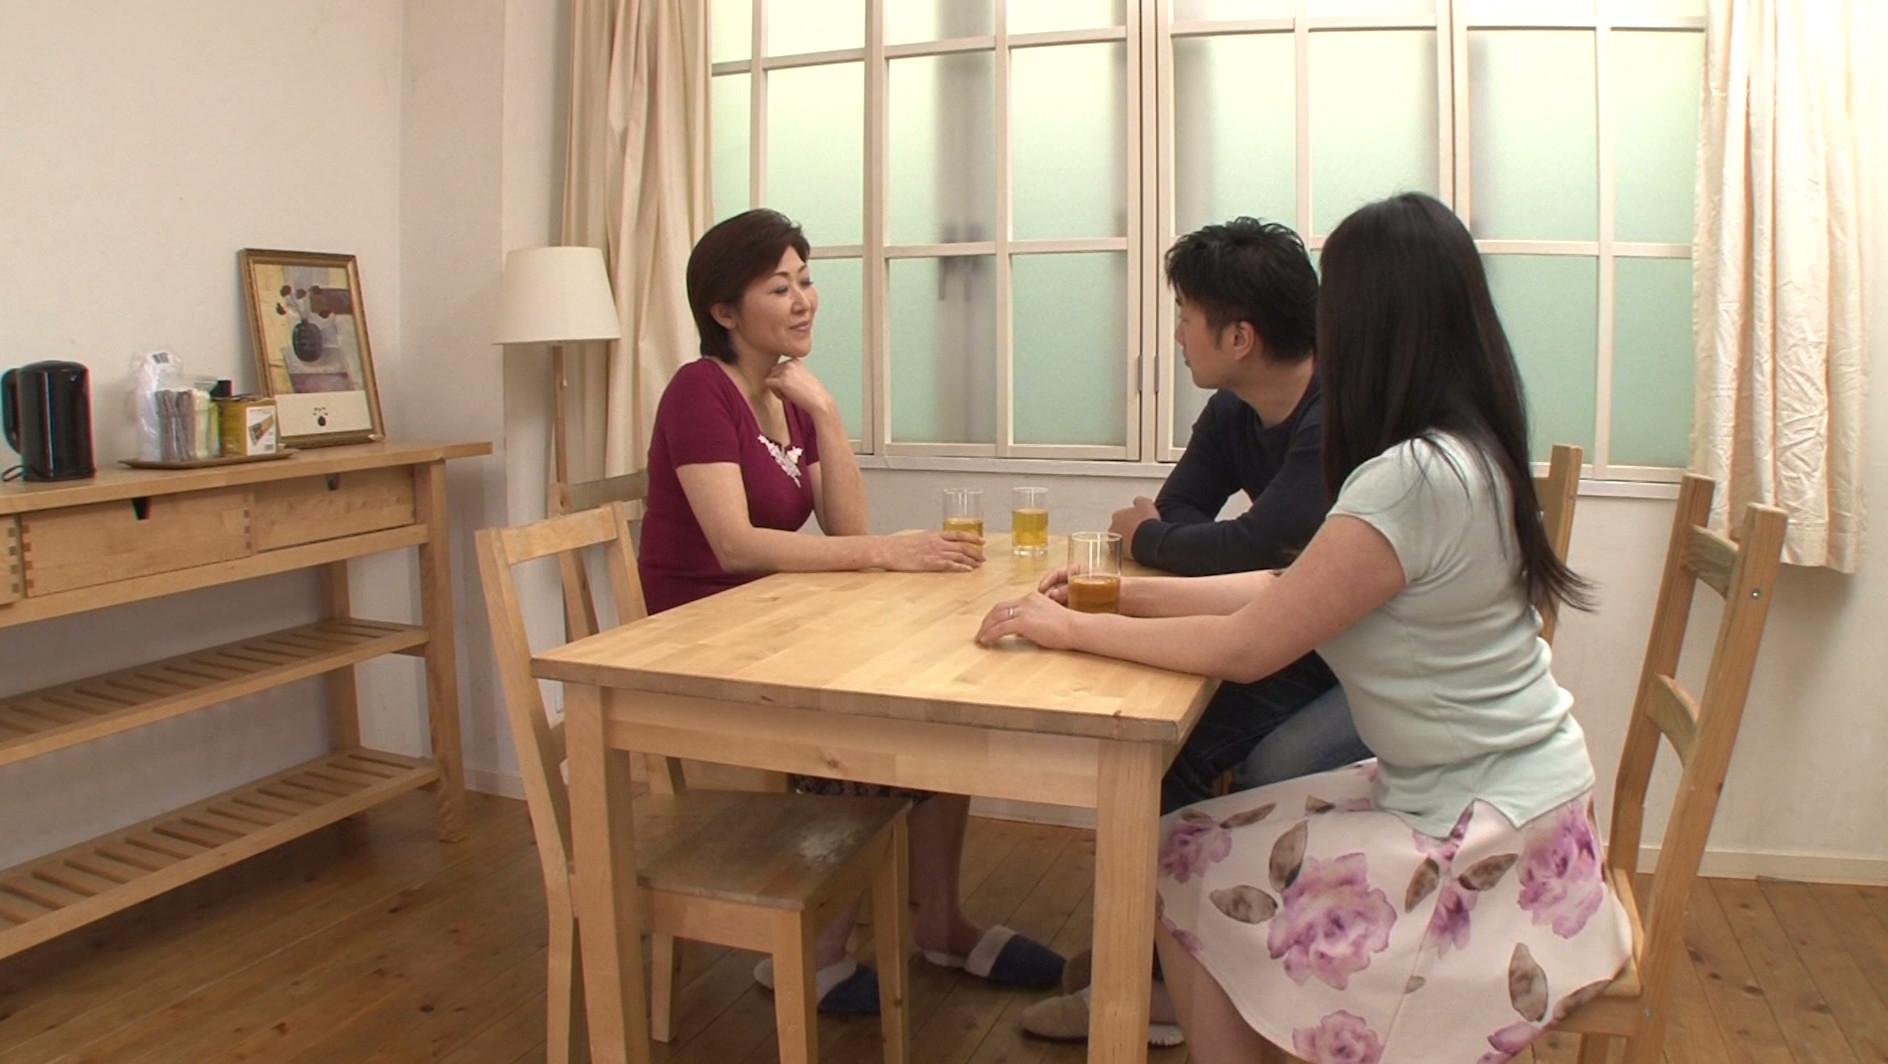 sex pics japanese girl sucks bbc in public videos free